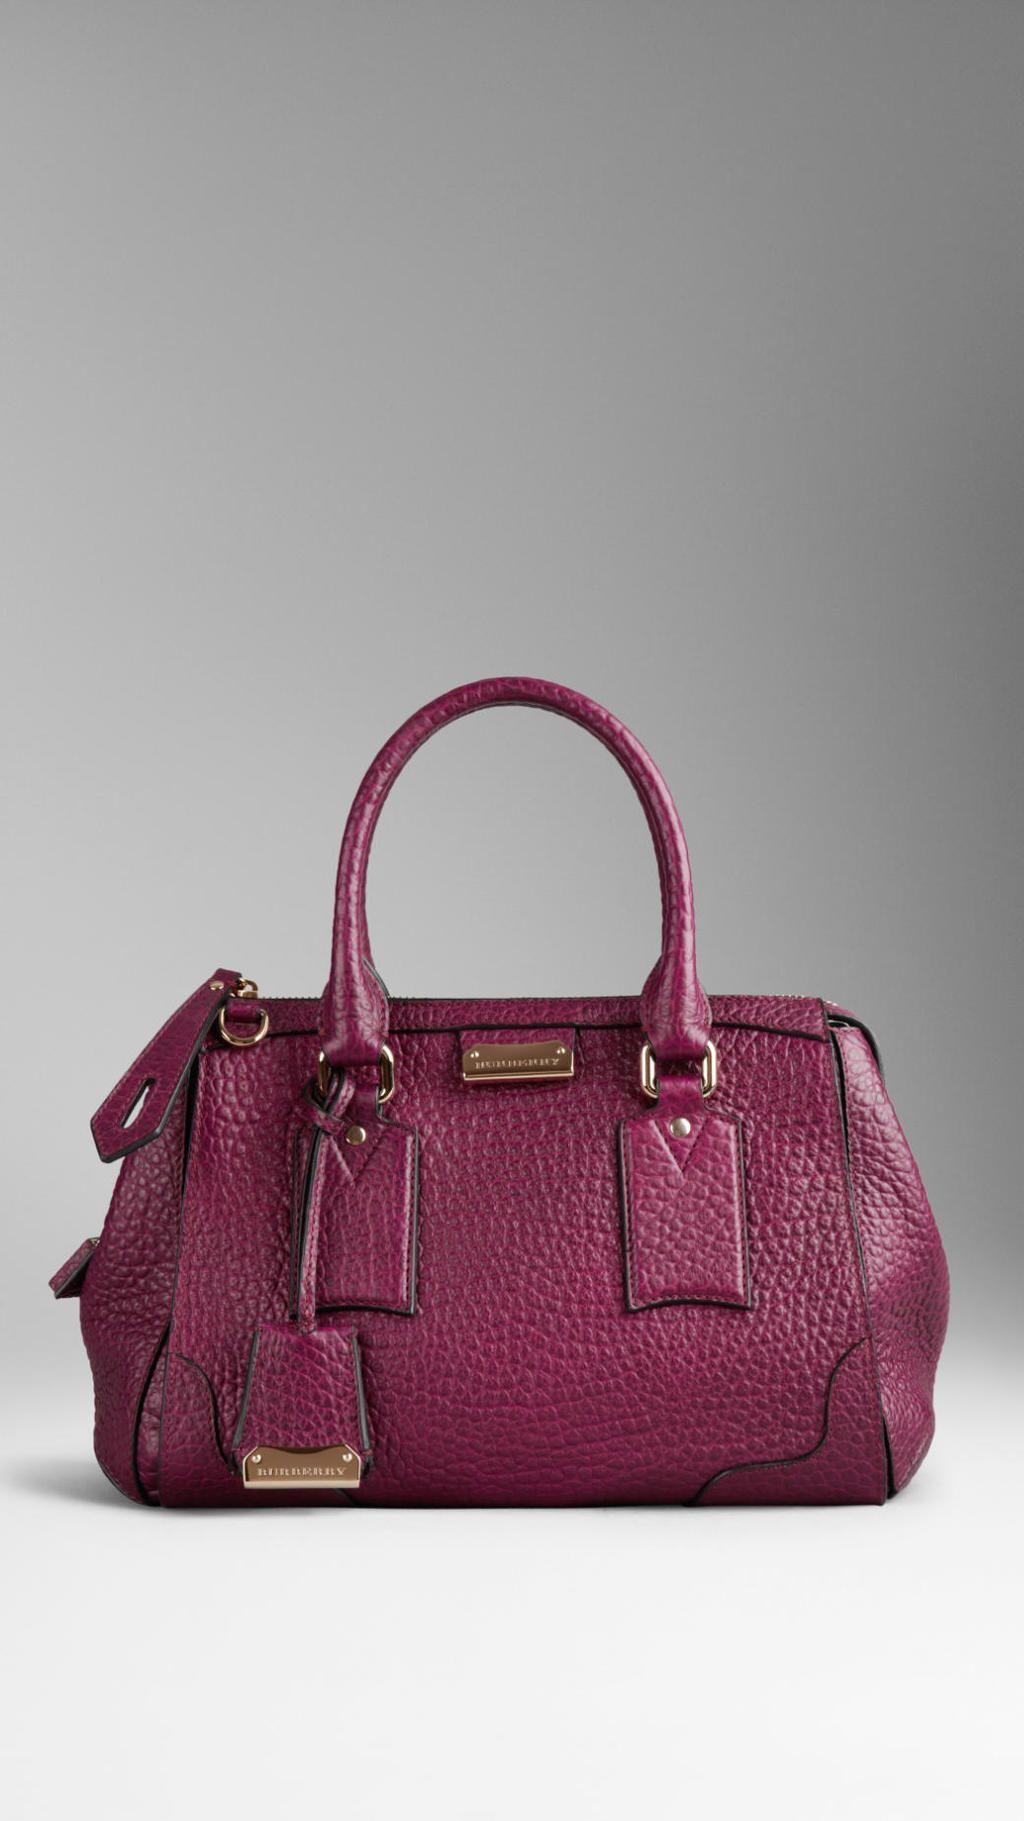 6b726b95ab12 Burberry - Purple Small Heritage Grain Leather Tote Bag